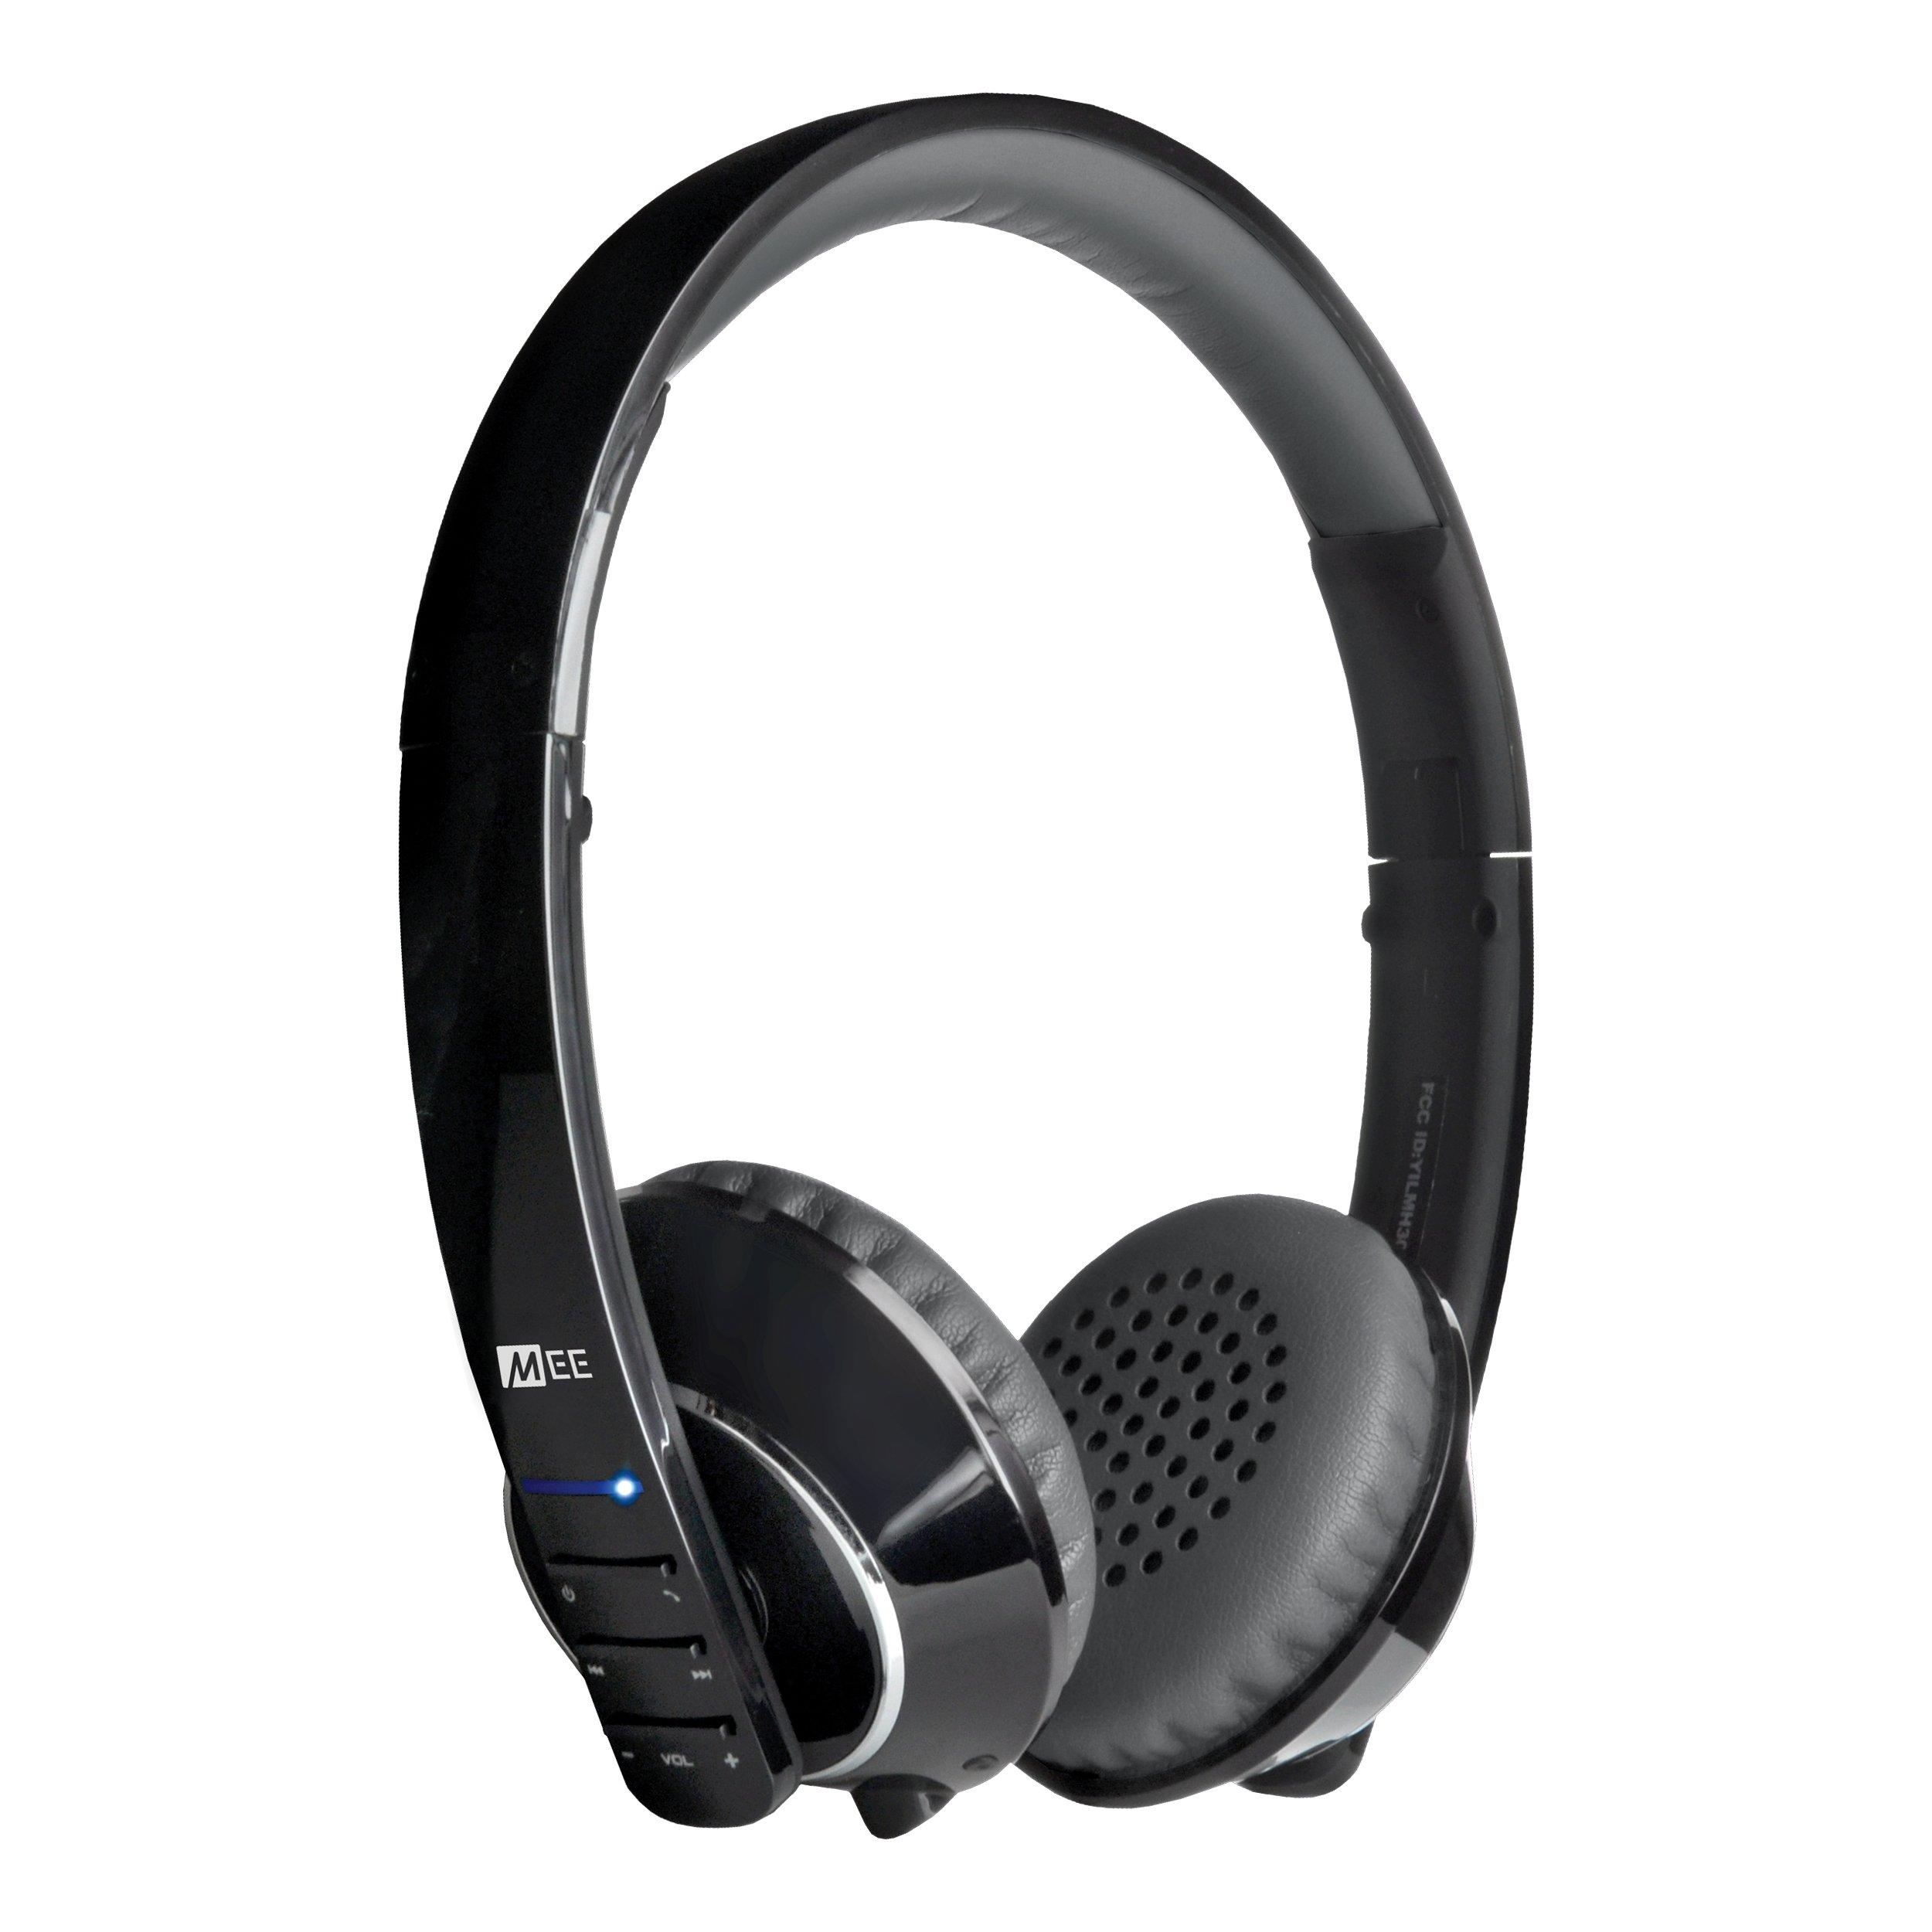 MEE audio Runaway 4.0 Bluetooth Stereo Wireless + Wired Headphones with Microphone (Black)